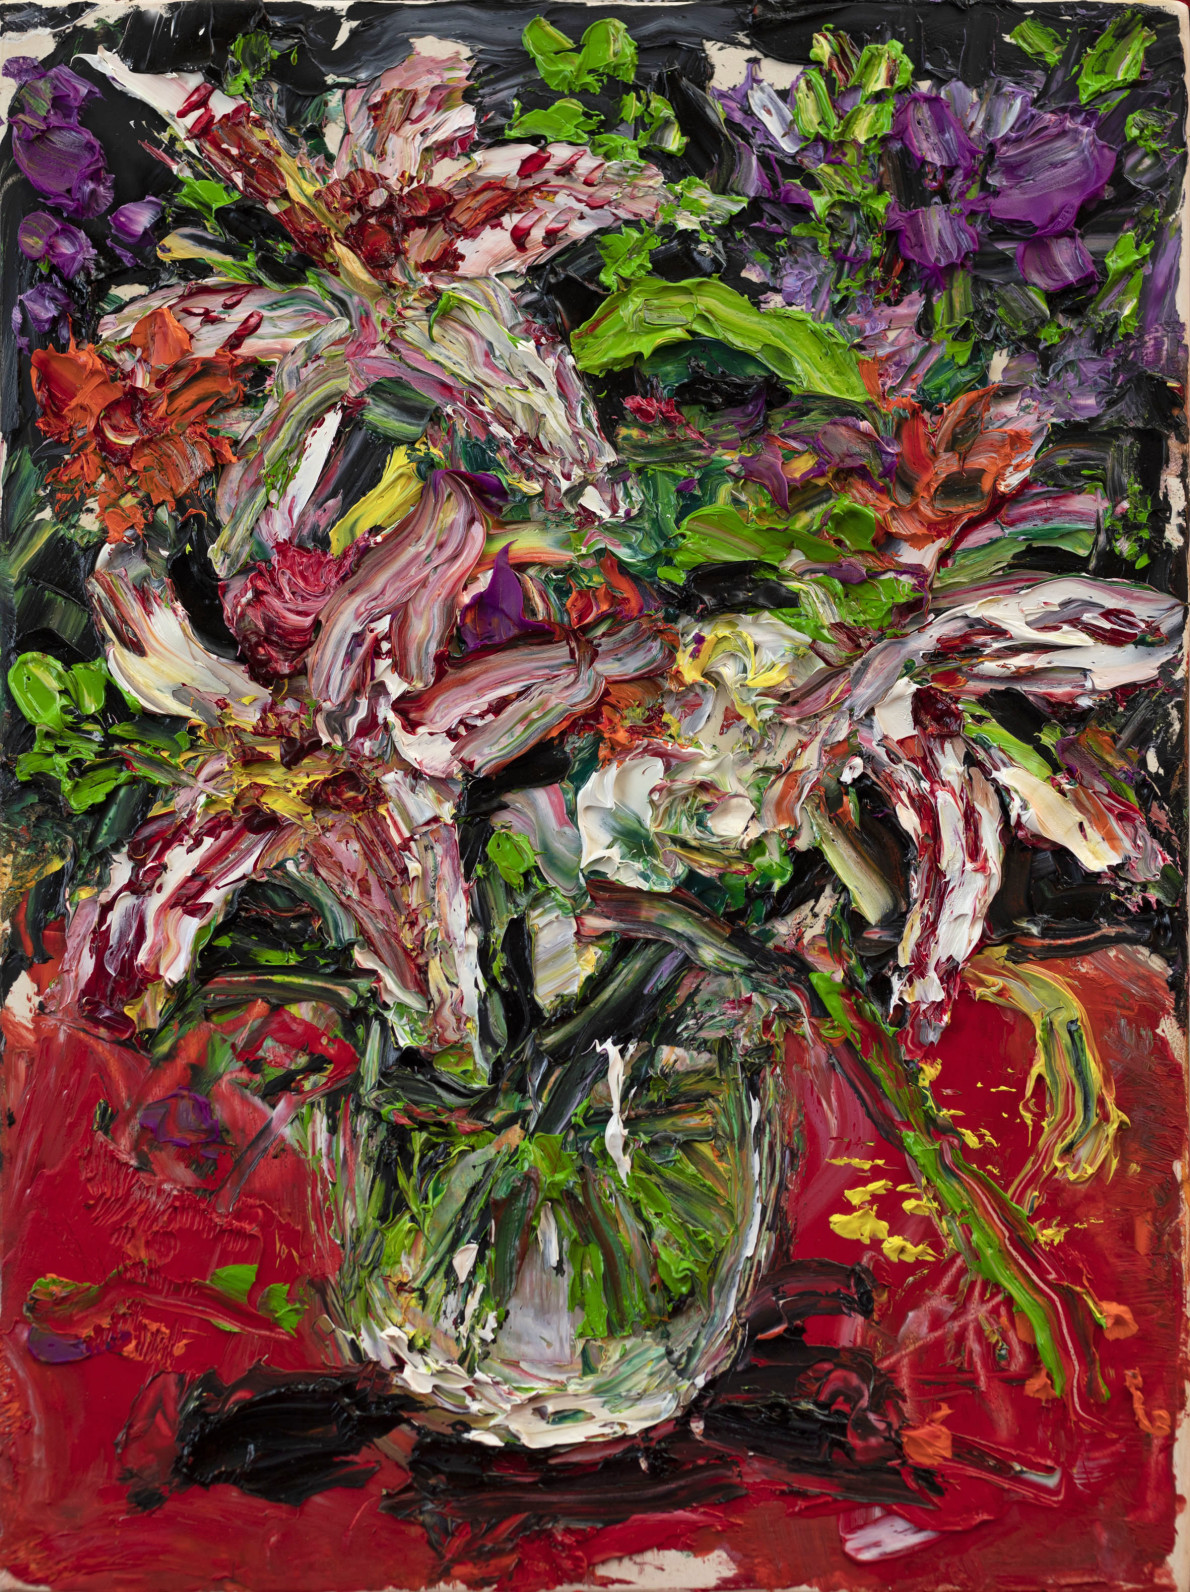 Shani Rhys James, Lilies, 2021